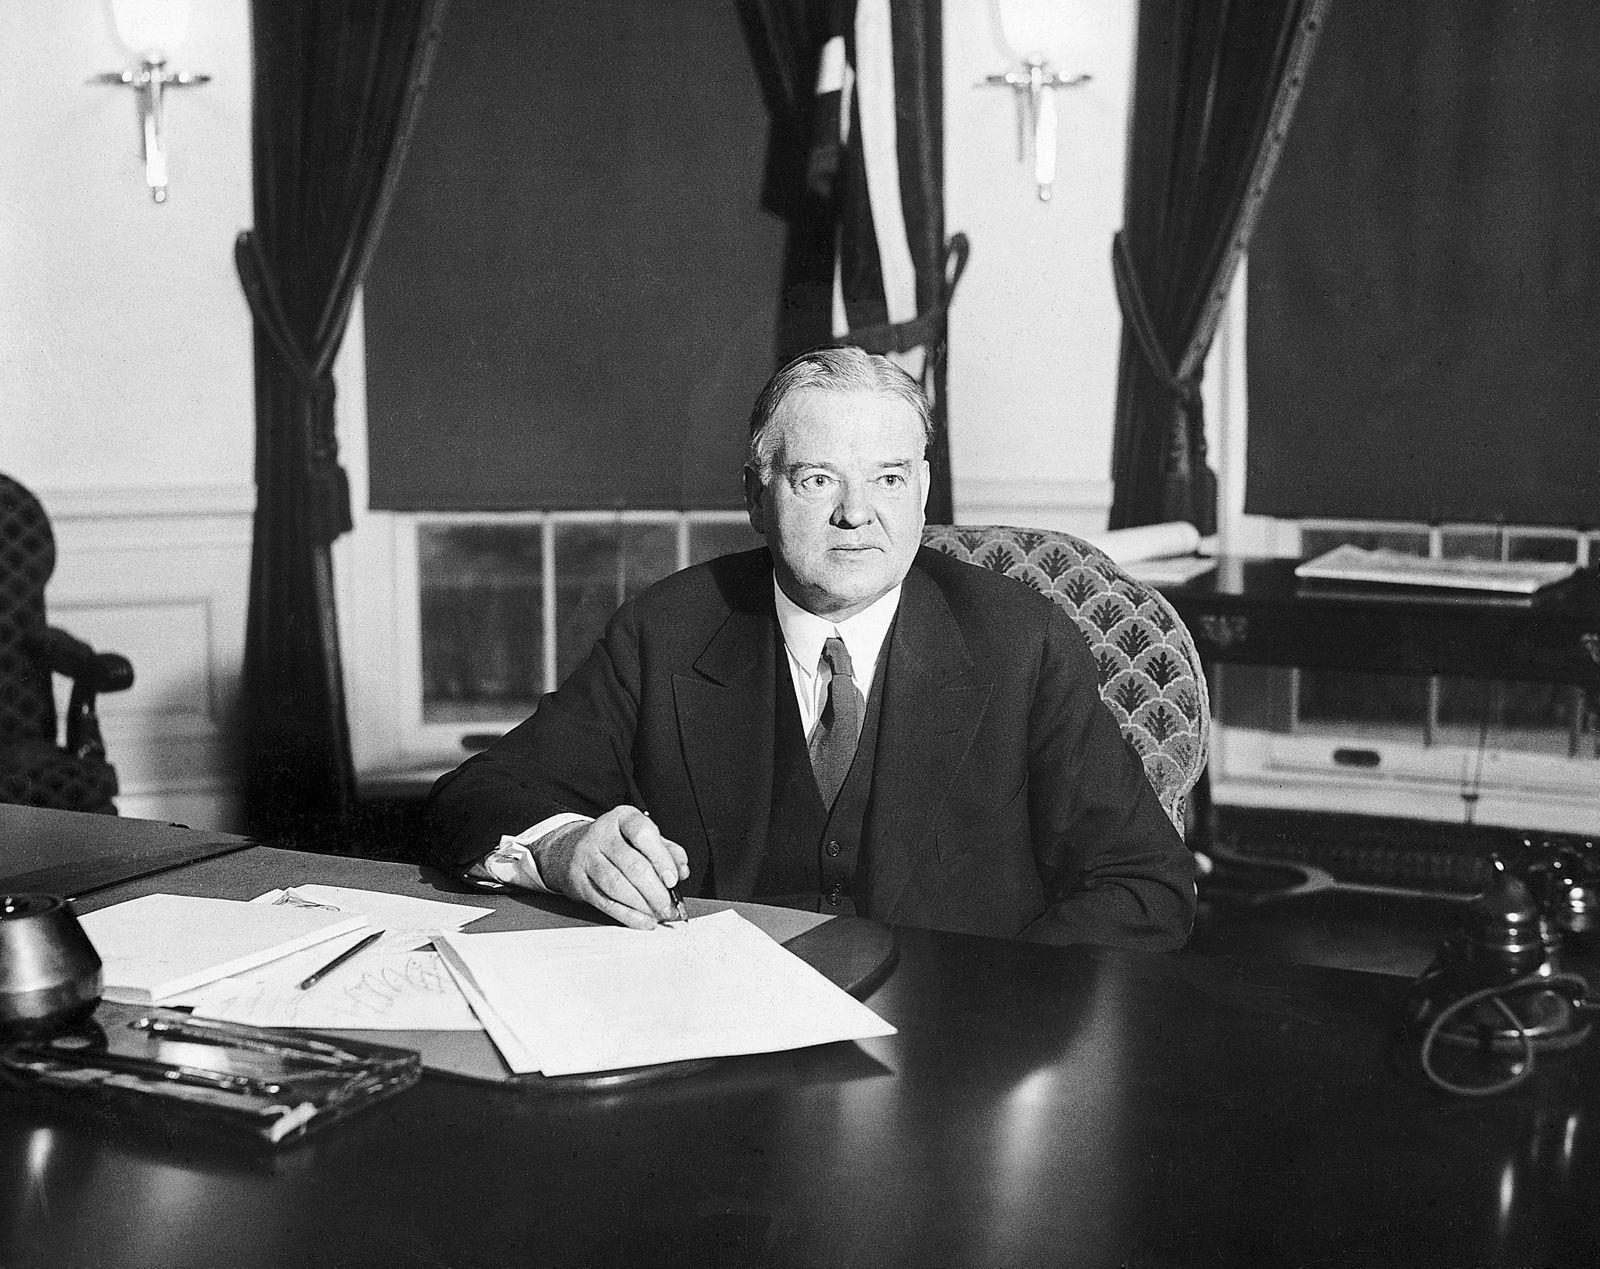 Herbert Hoover Signs Paper At Desk